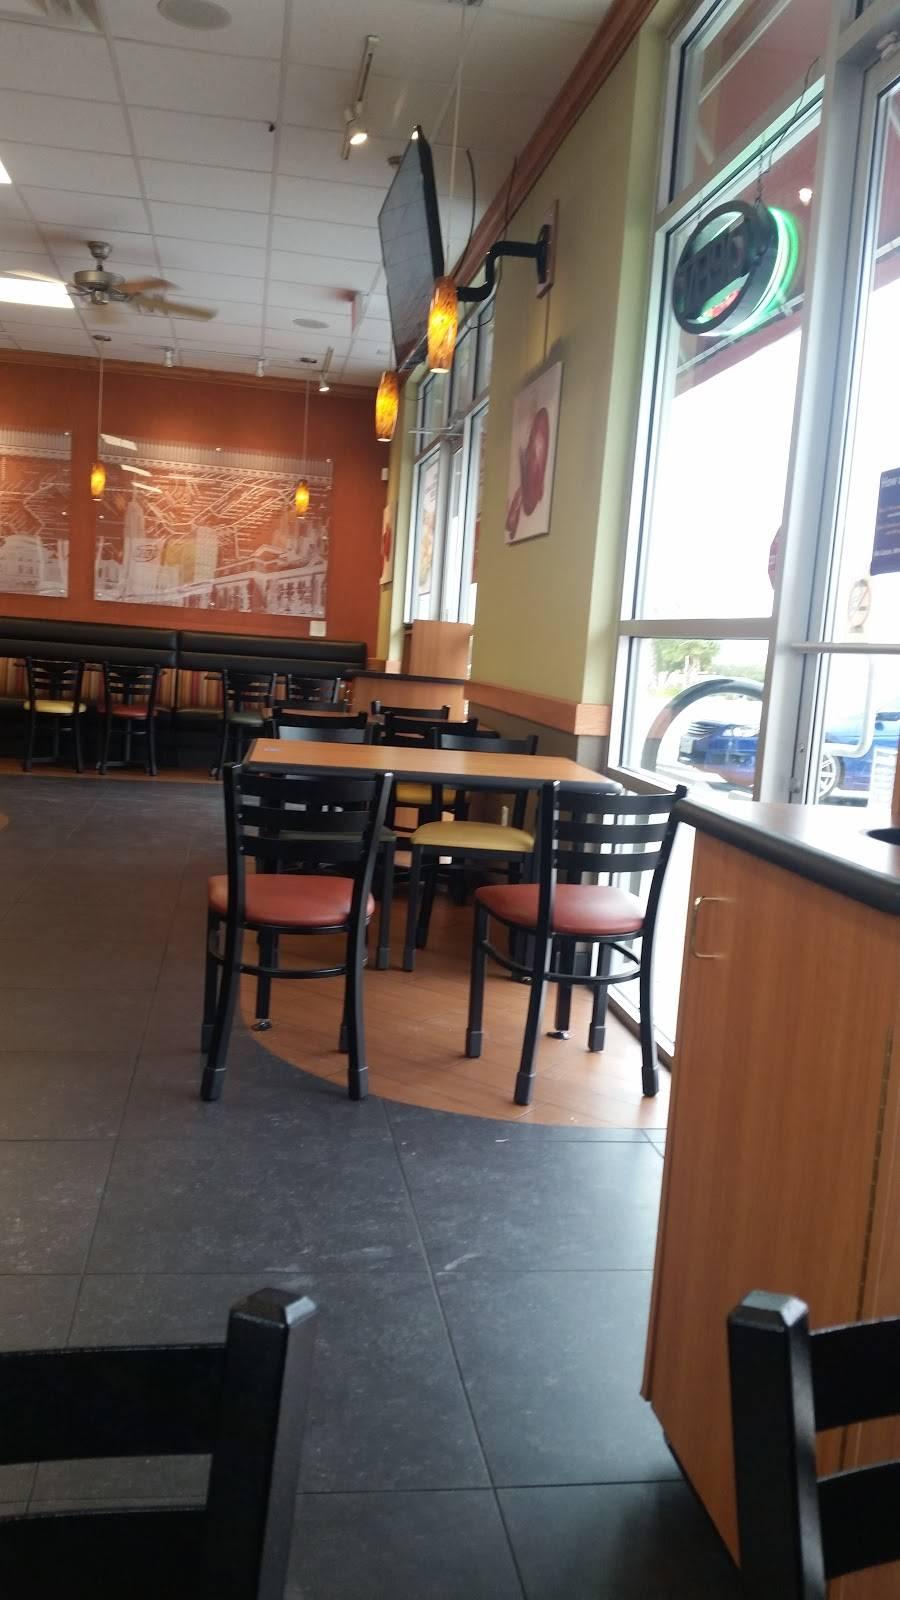 Subway - meal takeaway  | Photo 6 of 7 | Address: 6351, 402 S Desert Blvd Building D Suite 401, El Paso, TX 79932, USA | Phone: (915) 307-6135